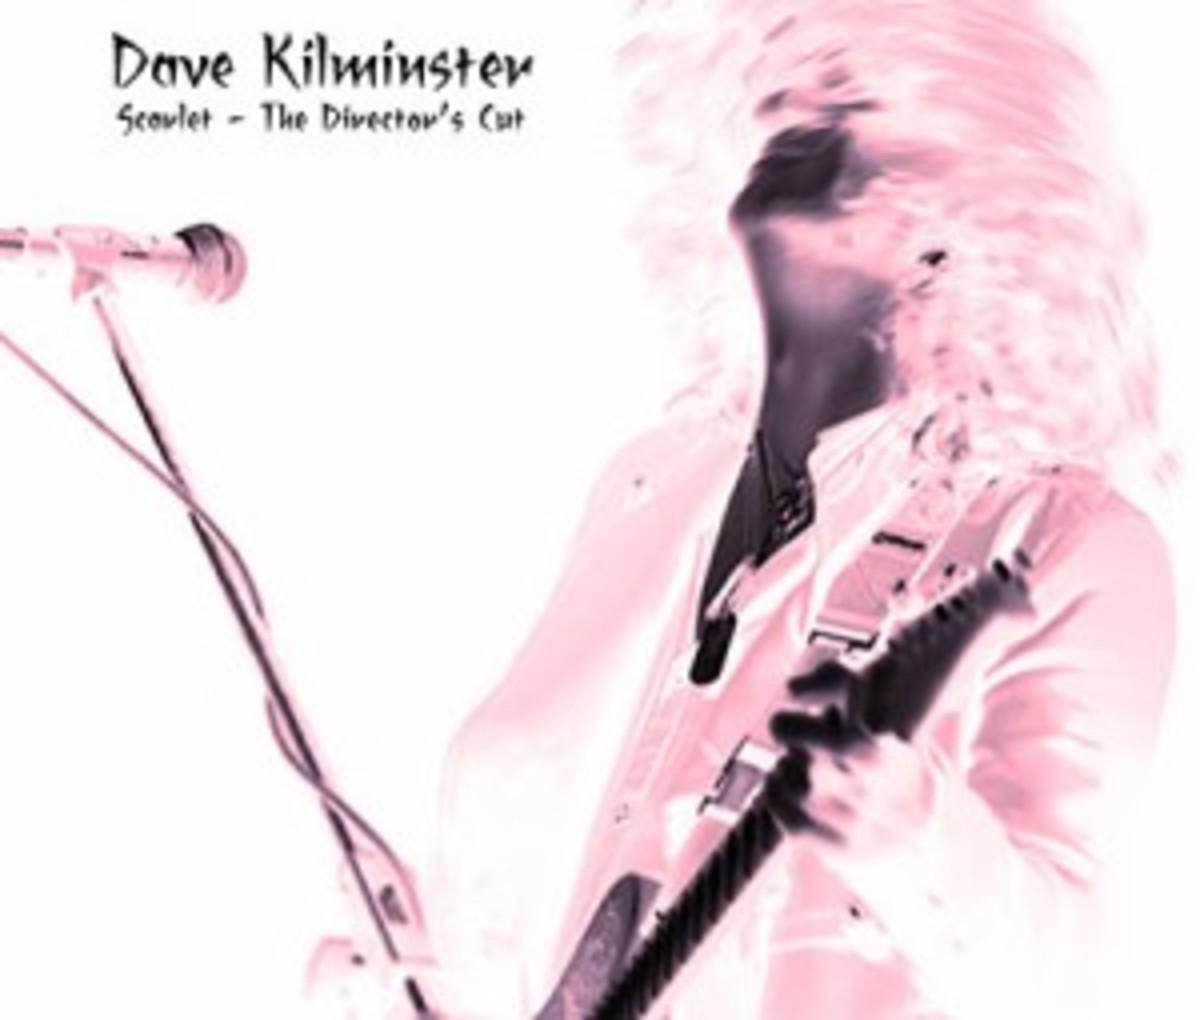 DaveKilminster_Scarlet